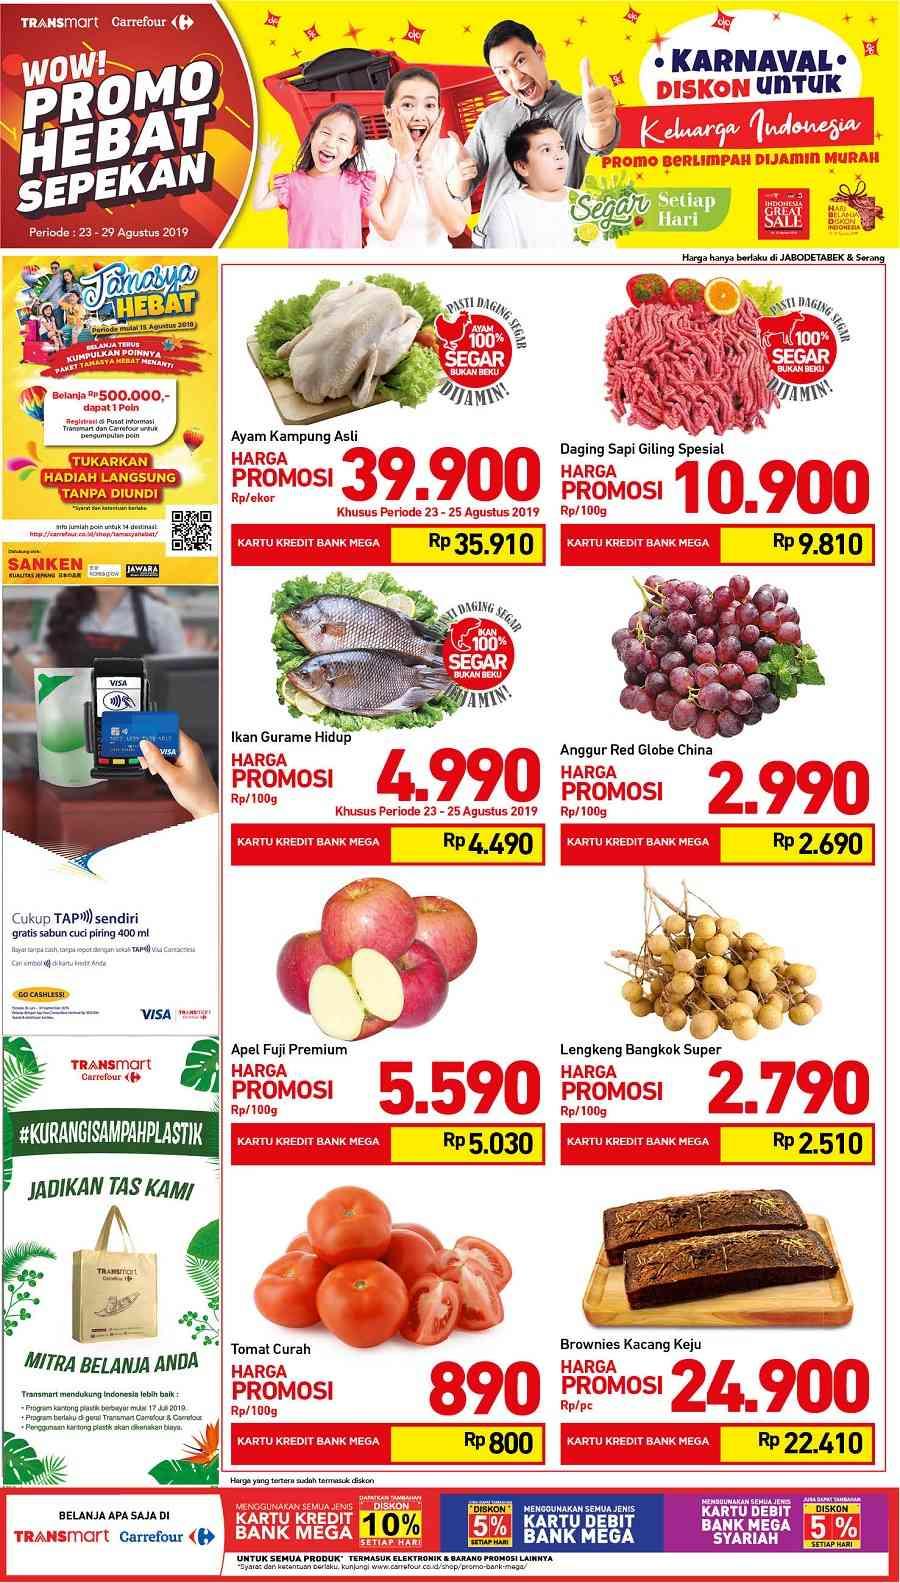 Transmart Carrefour Promo Produk Fresh Akhir Pekan periode 23-29 Agustus 2019